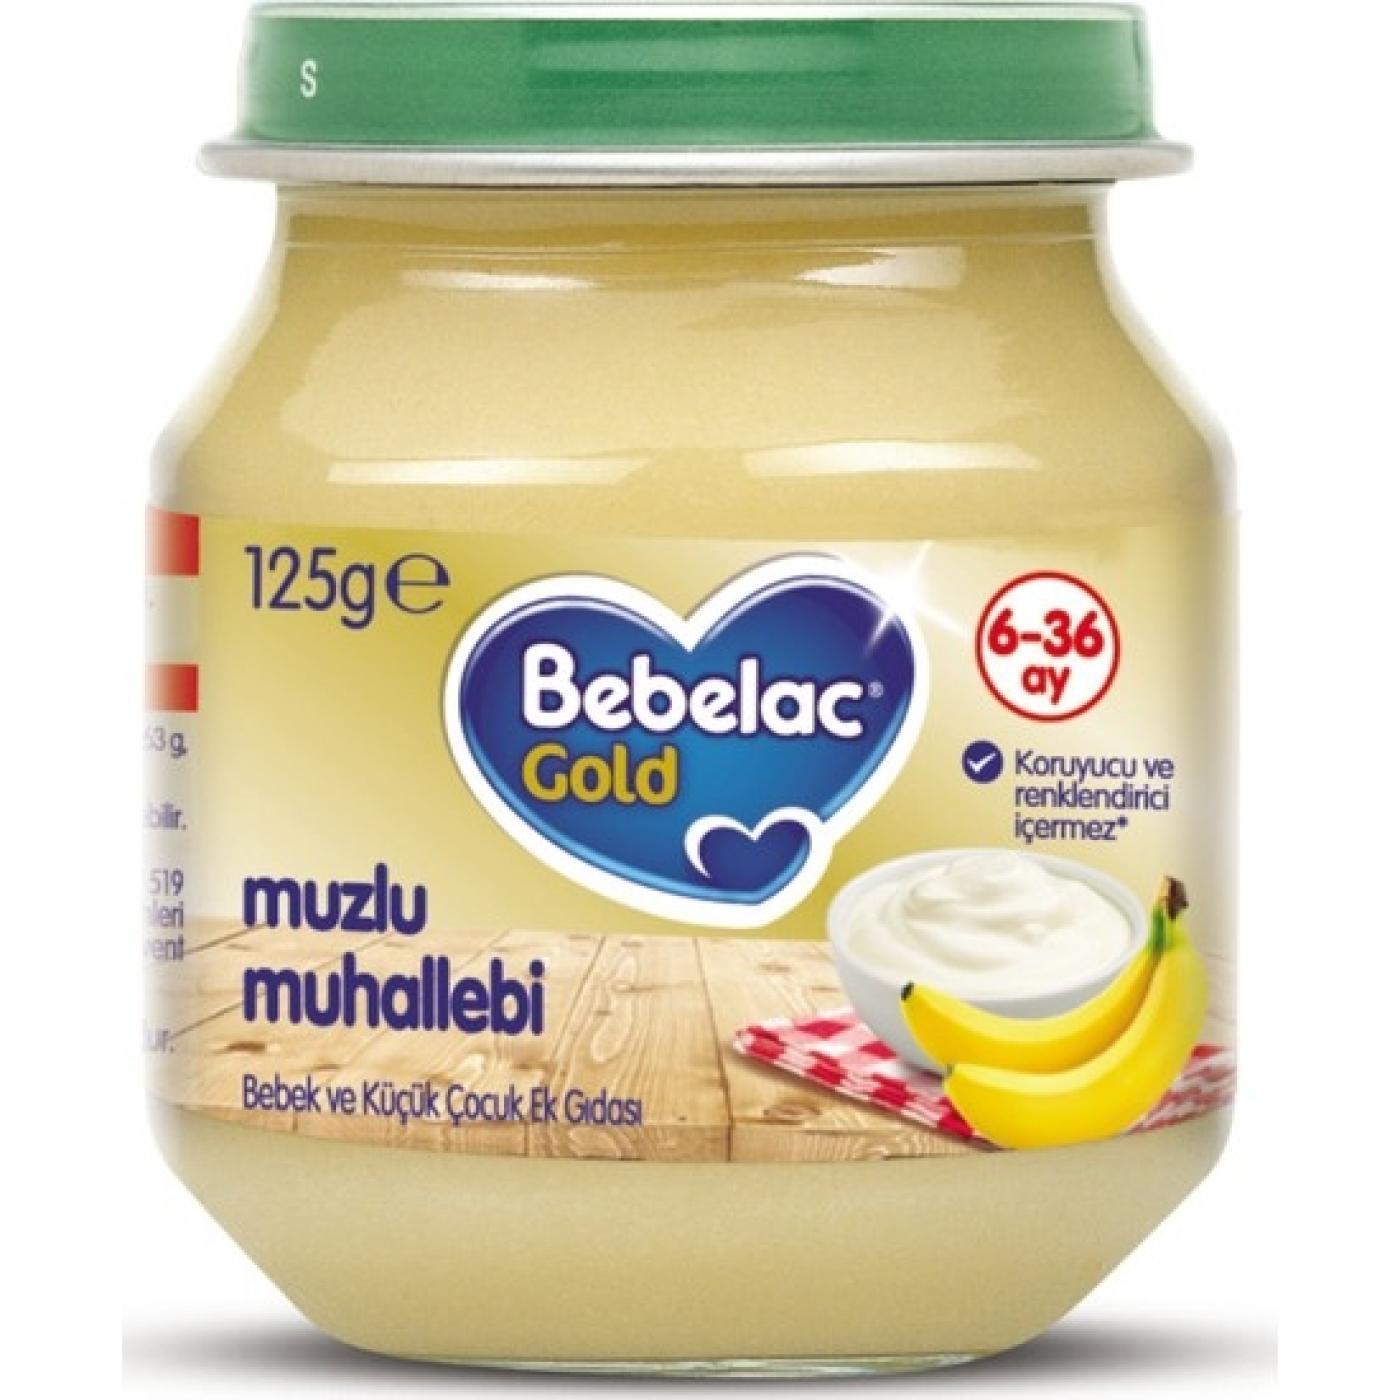 BEBELAC GOLD 125GR MUZLU MUHALLEBİ